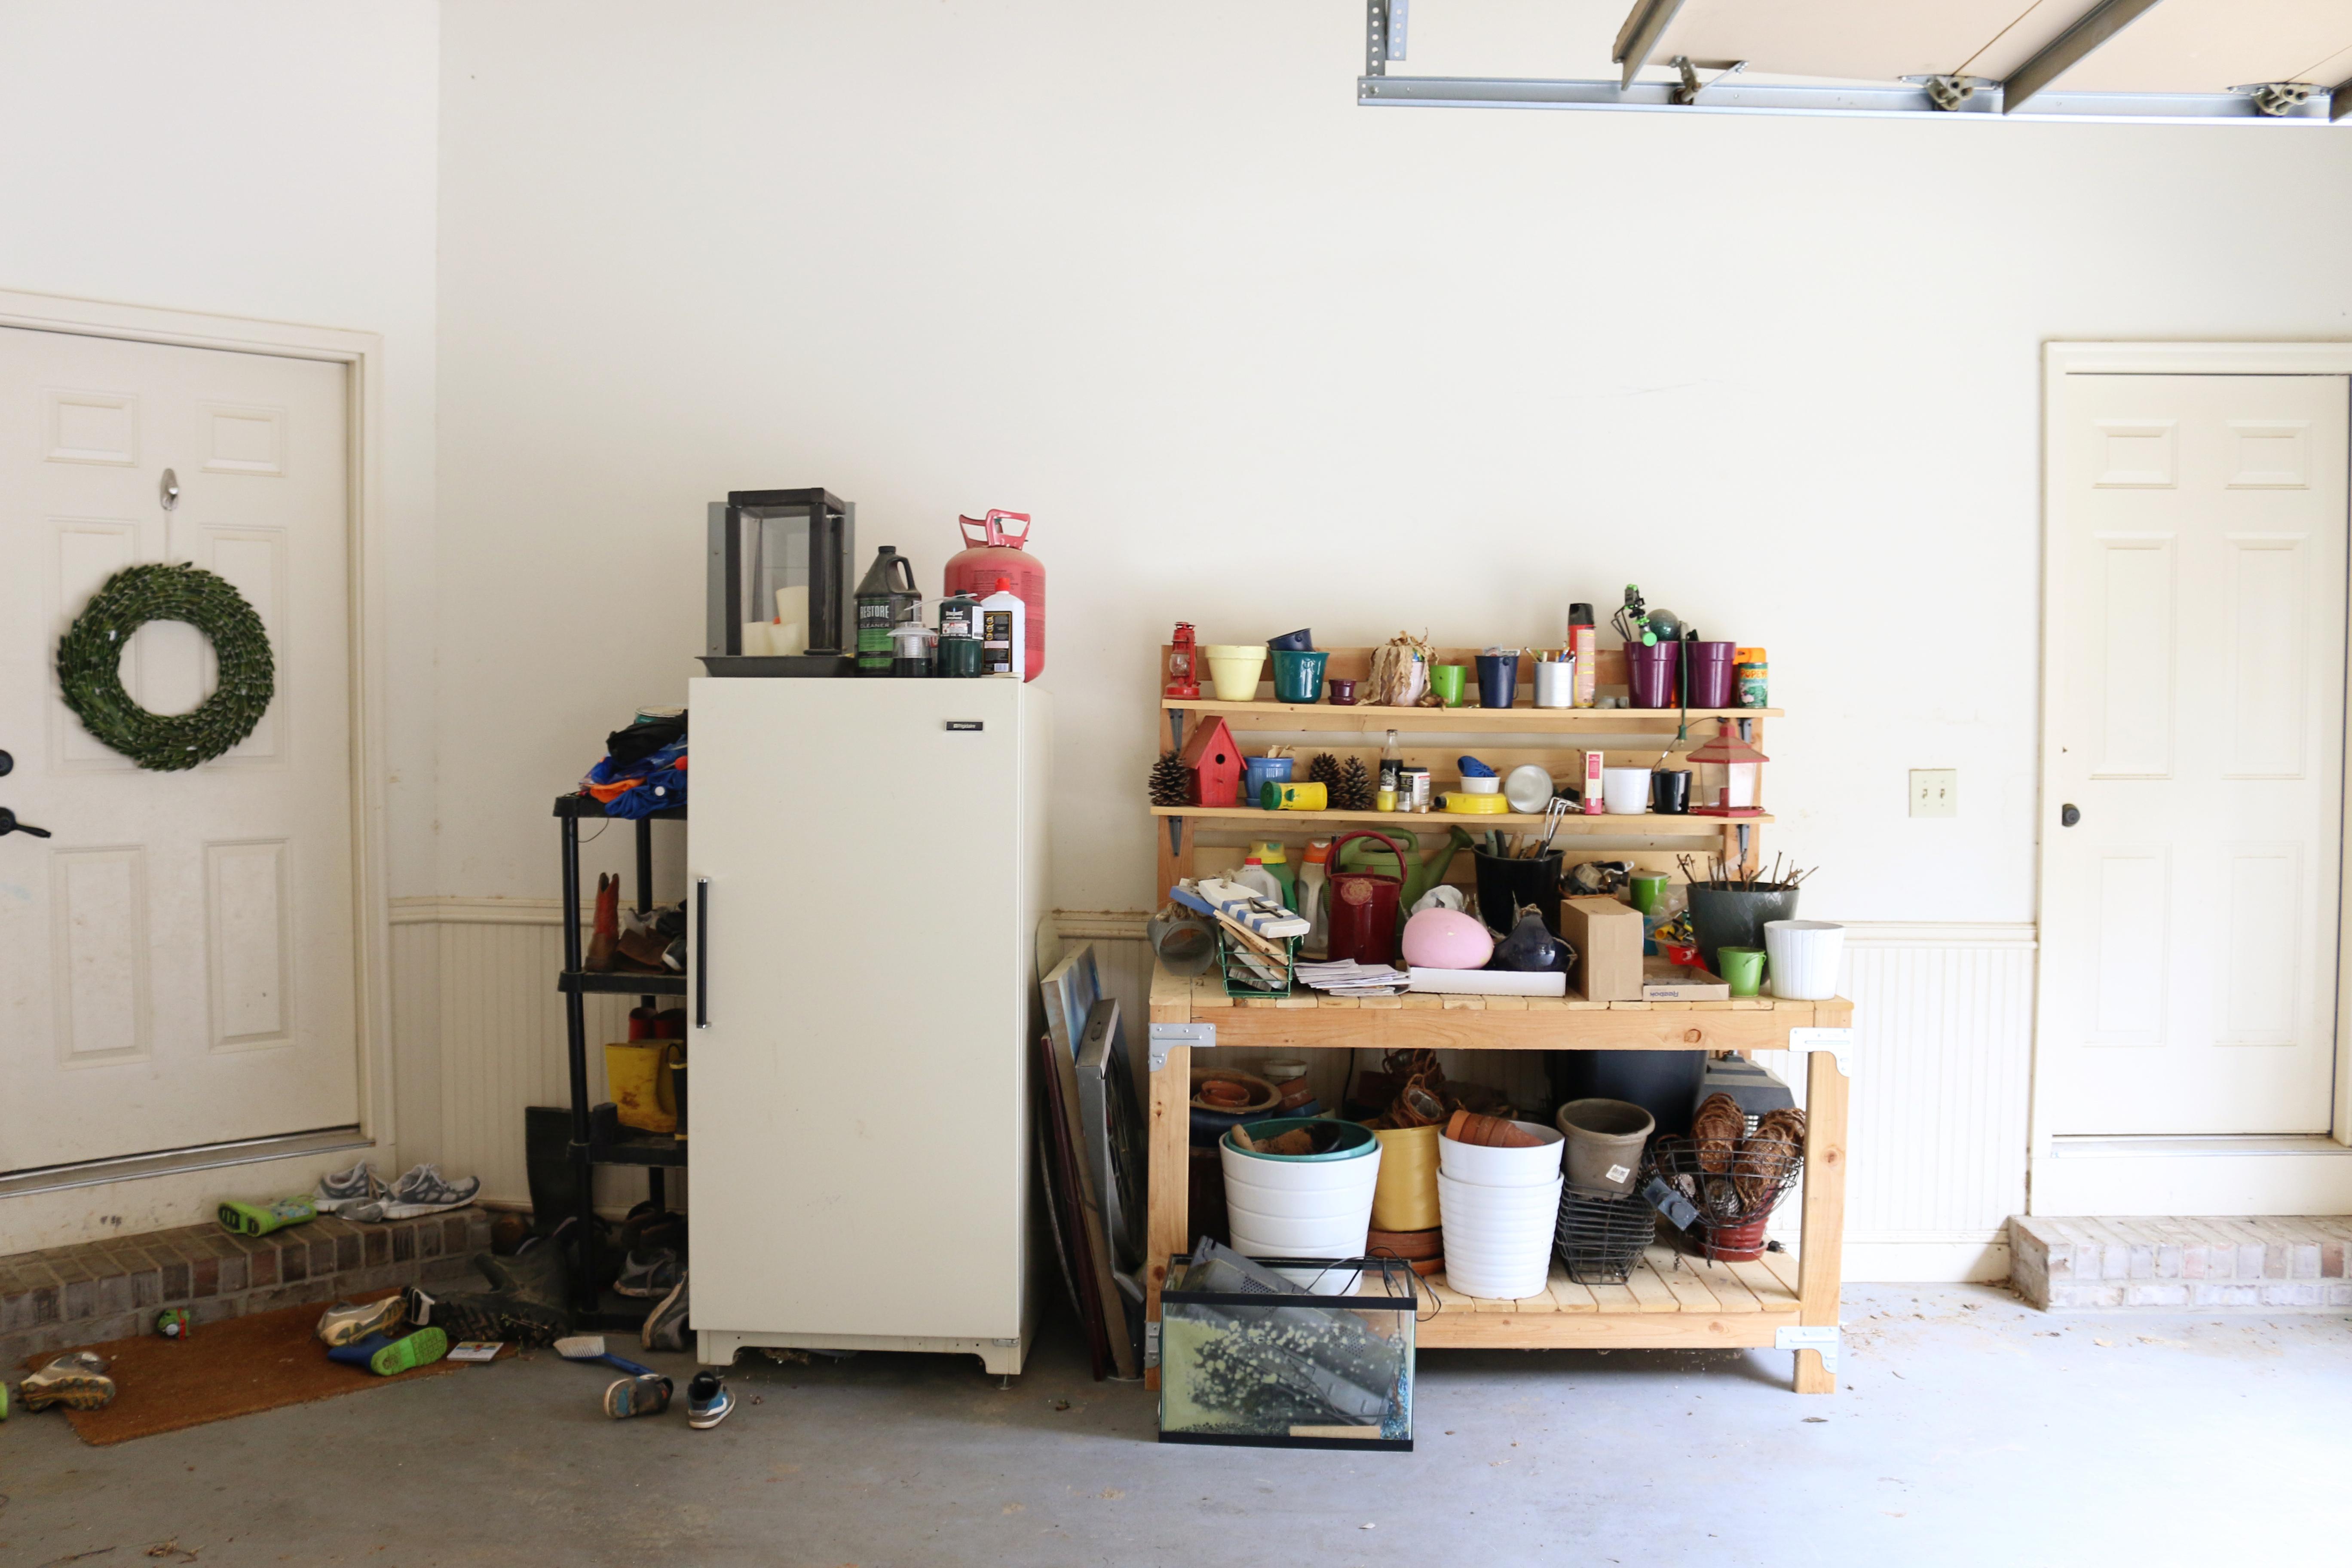 Garage Reveal - Bower Power